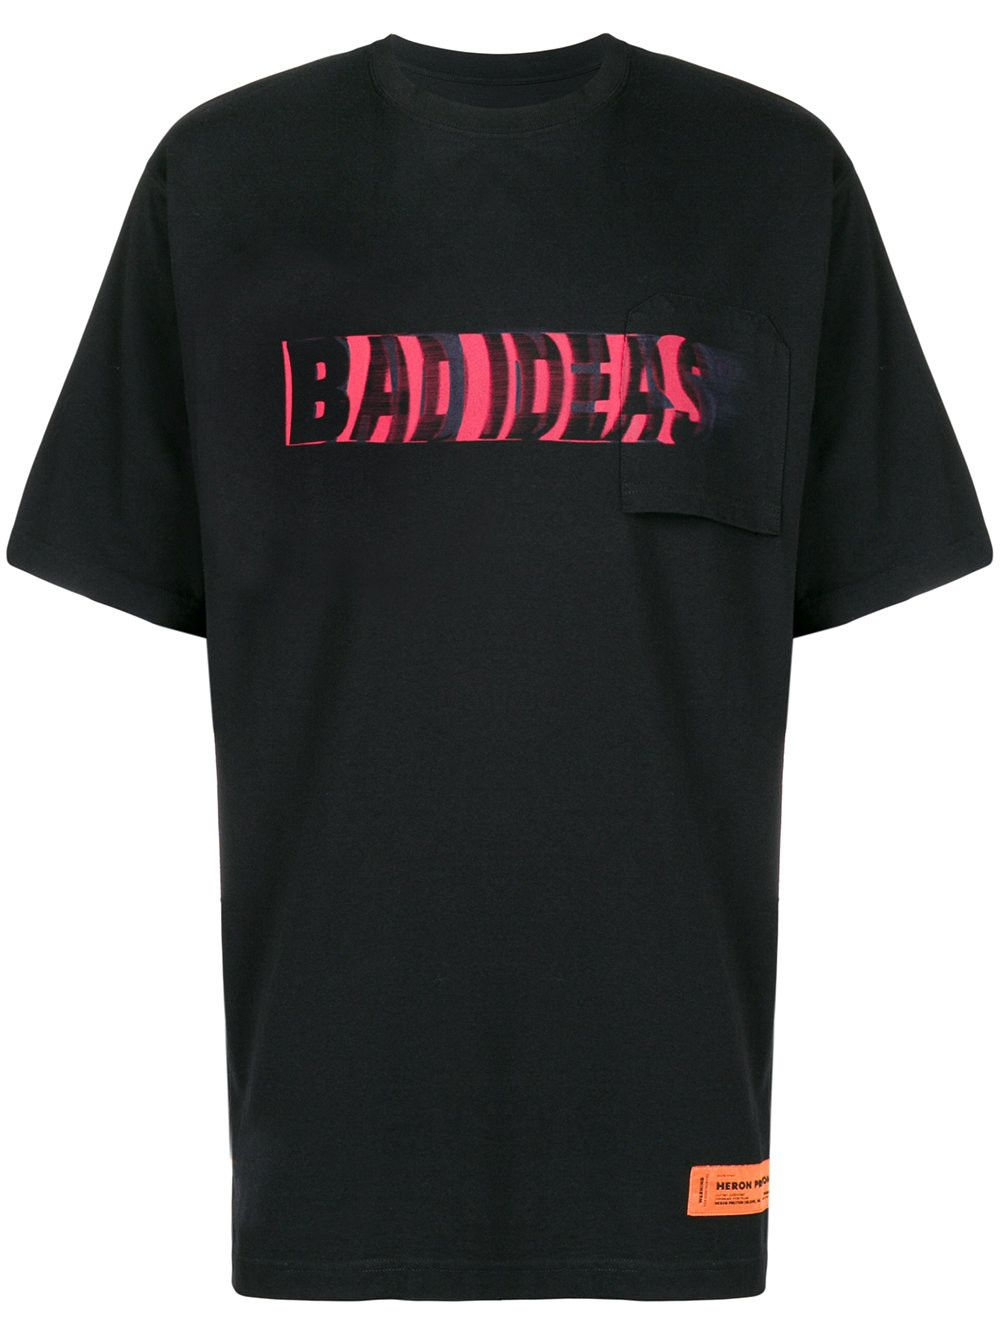 5c03abe87aff3 HERON PRESTON Bad Ideas print T-shirt.  heronpreston  cloth ...